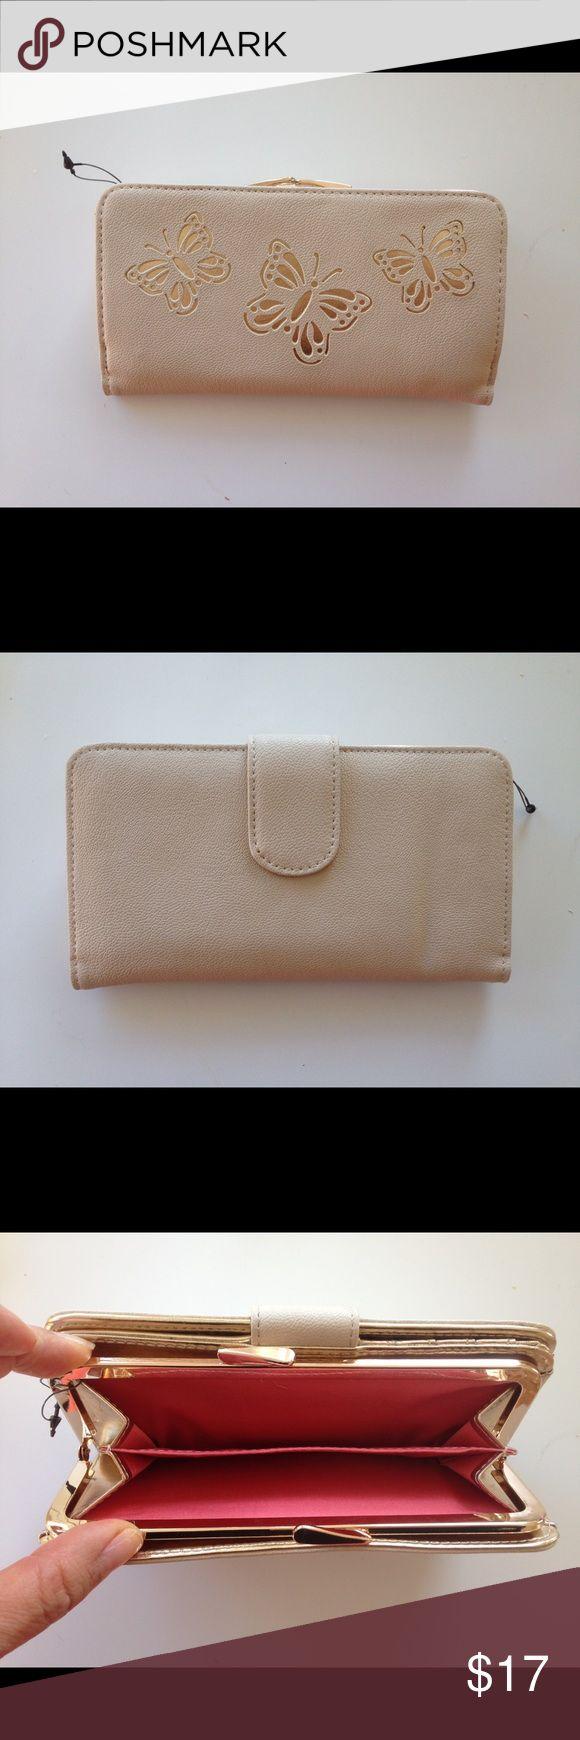 best 25+ beige clutch bags ideas on pinterest | pink clutch, pink